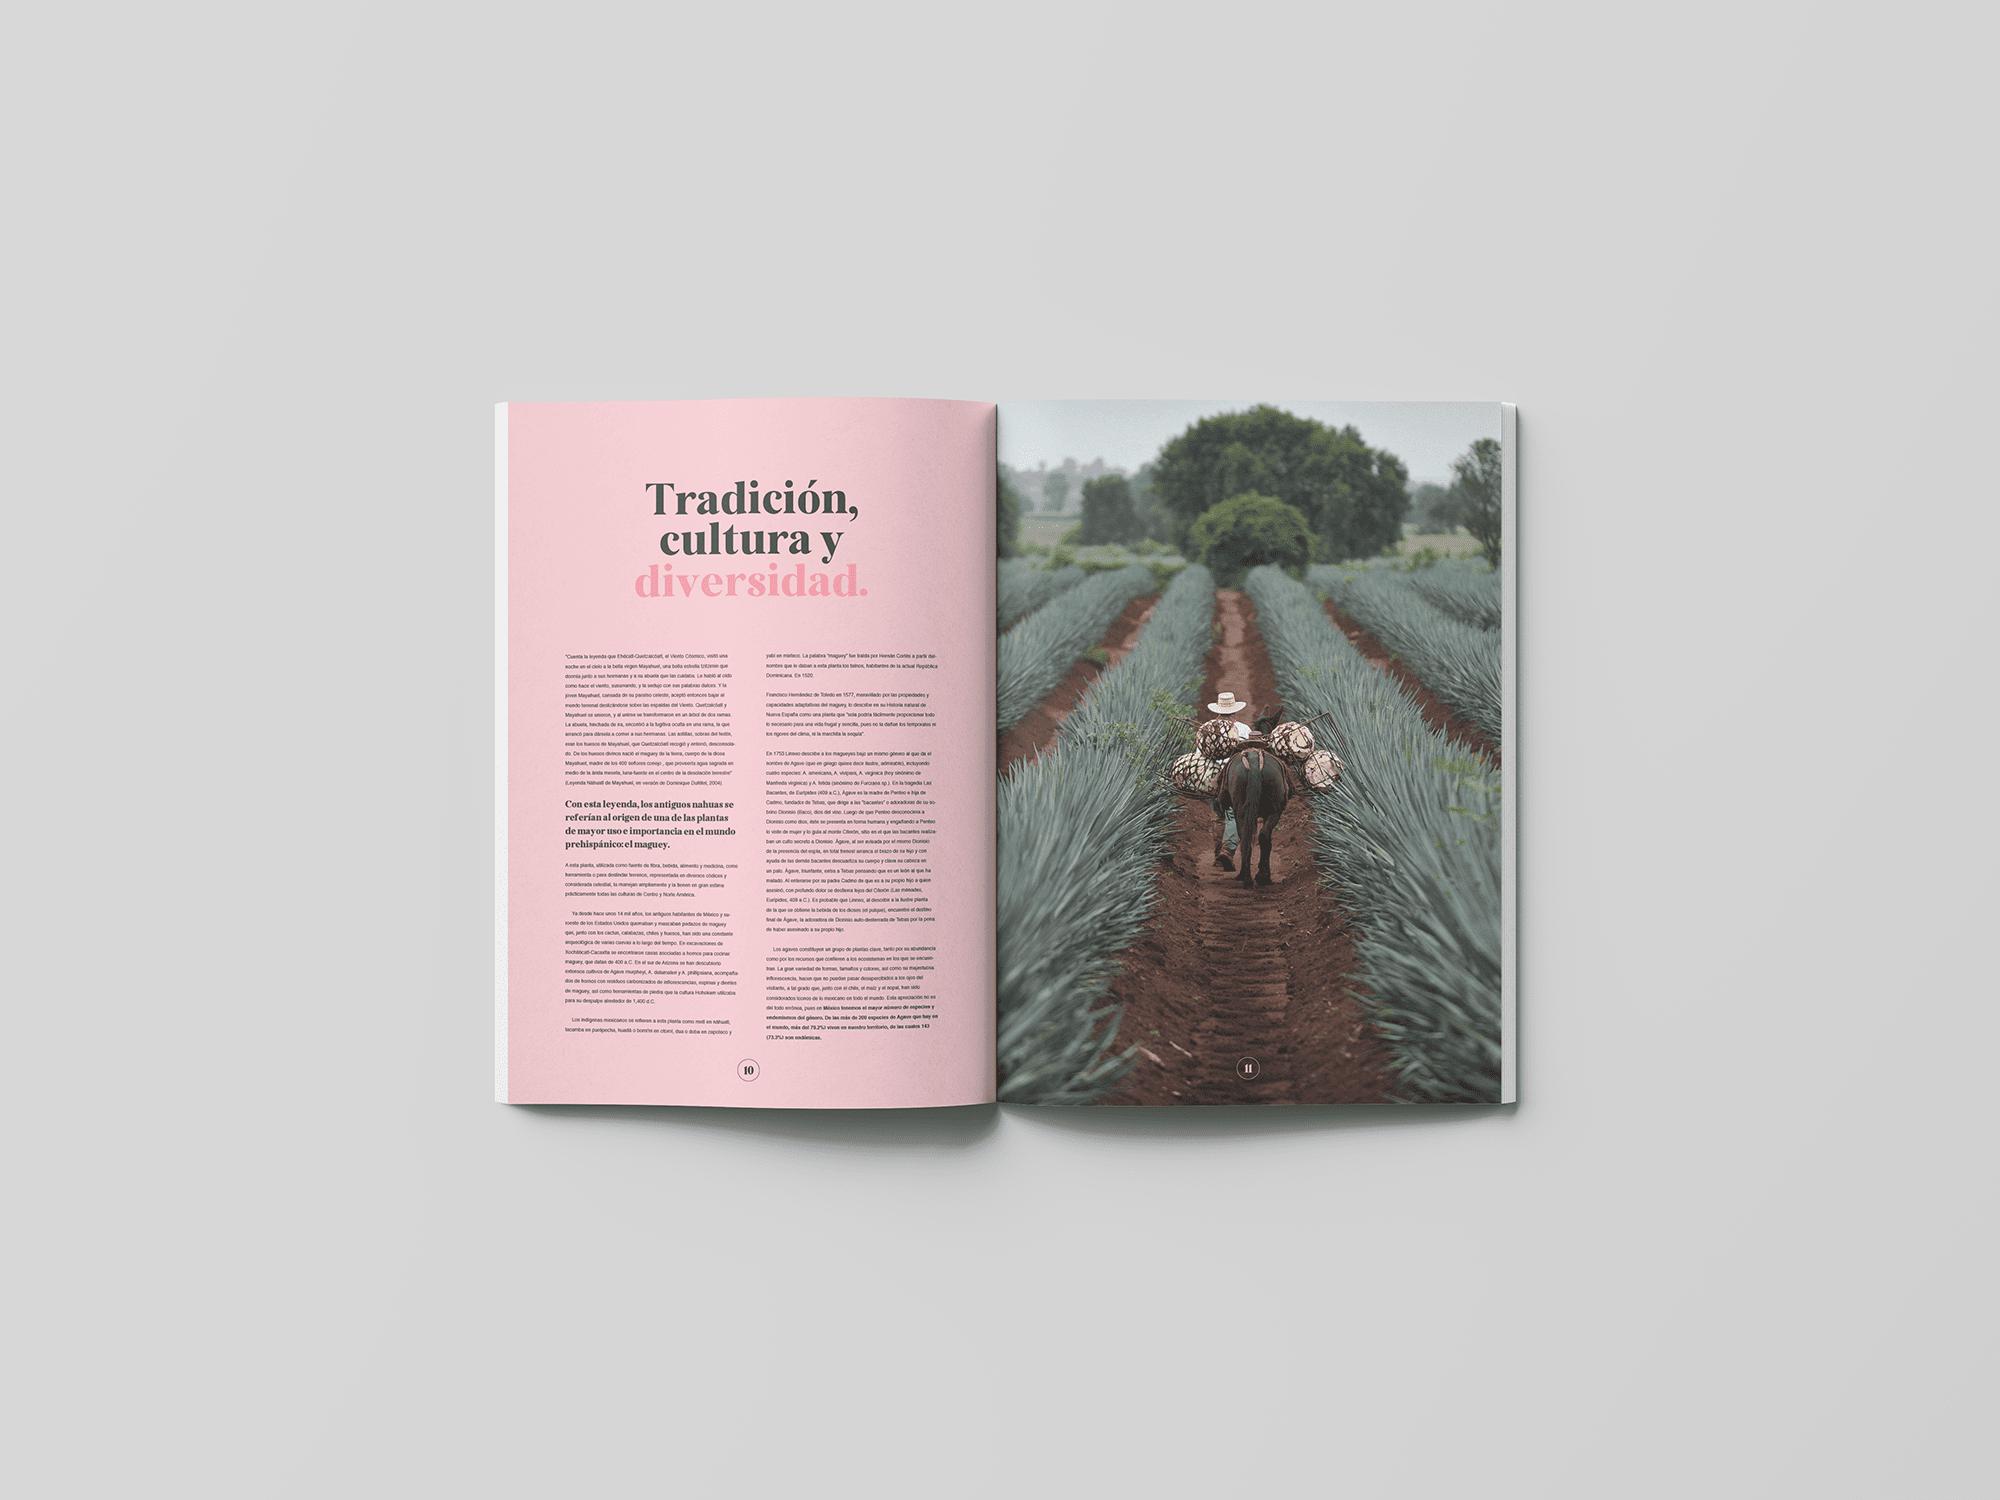 spread-02-book-agave-yoenpaperland (1)